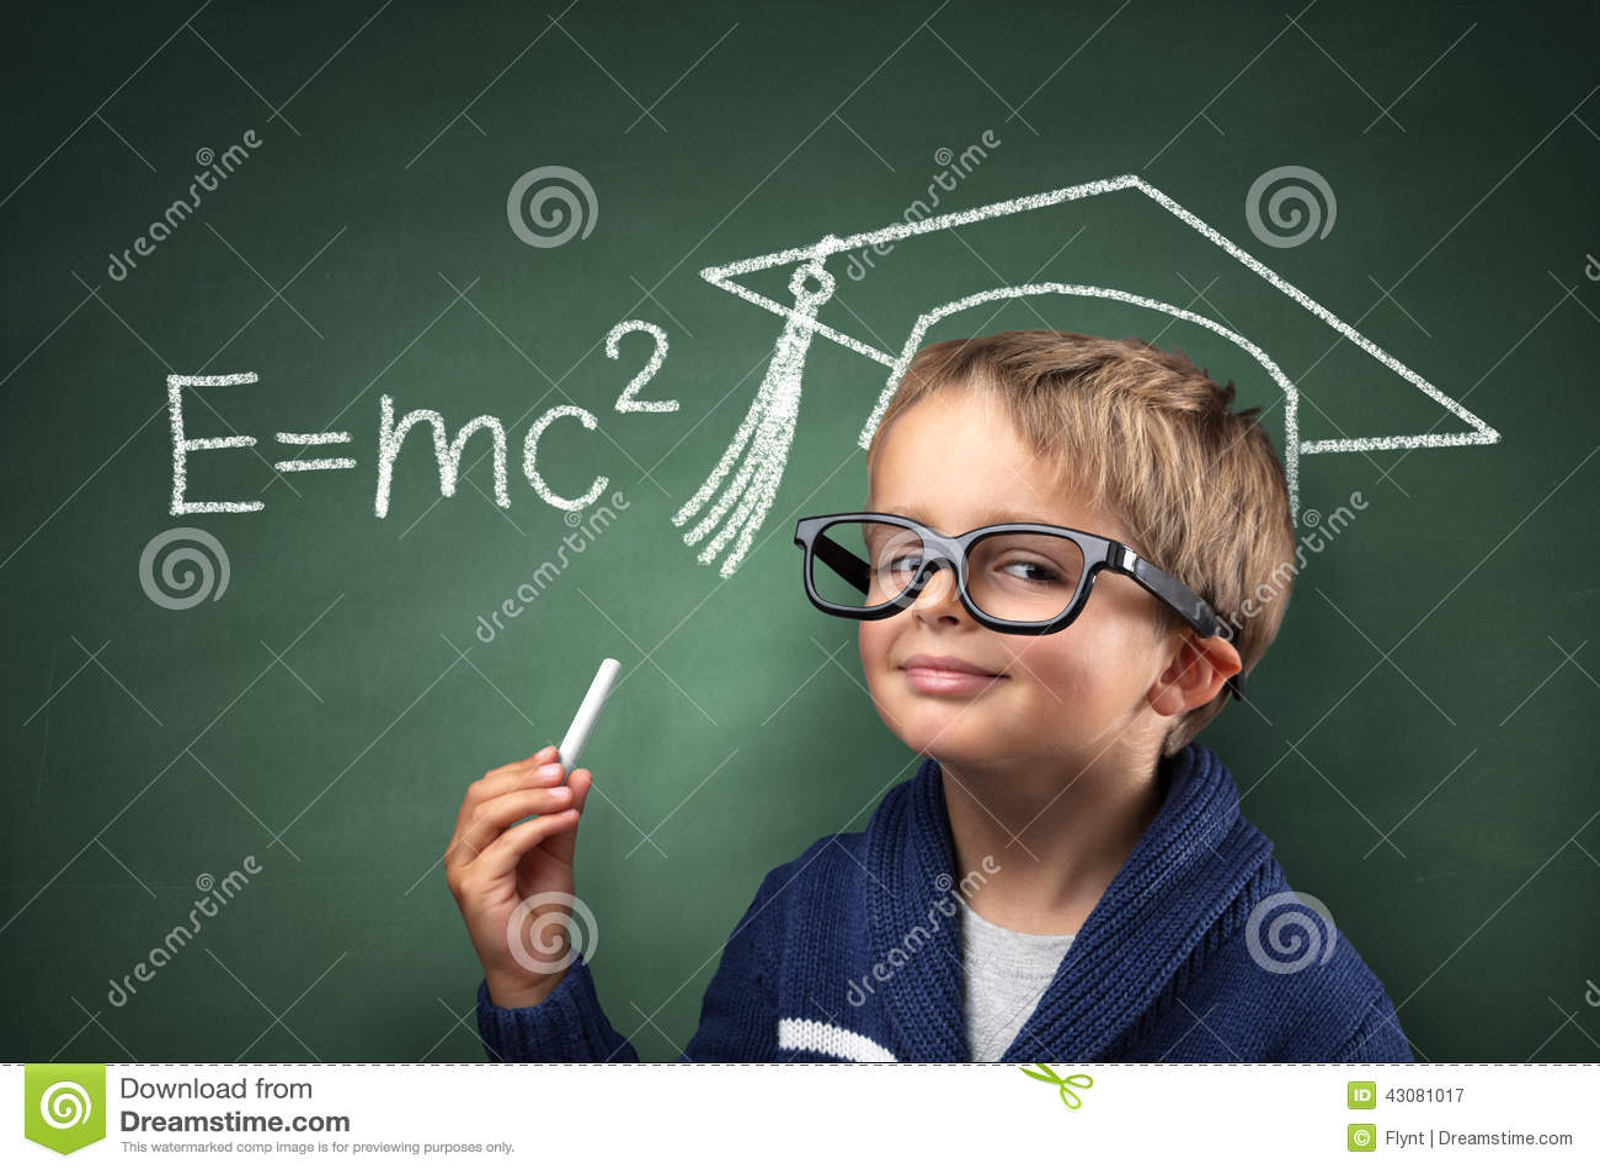 Classroom Chalkboard Ideas ~ Child genius in education stock photo image